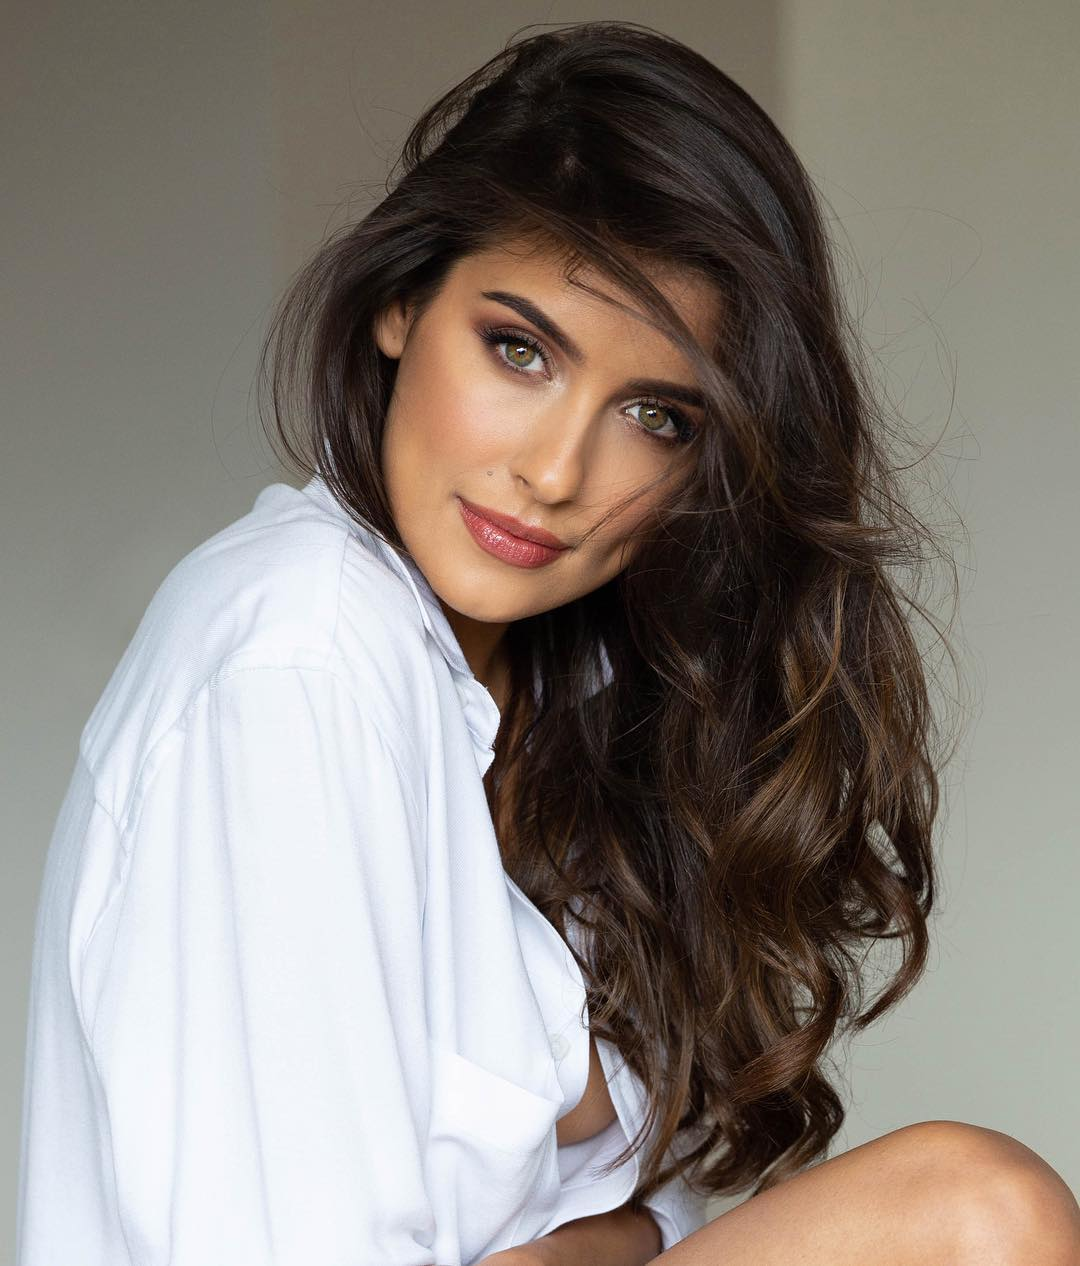 candidatas a miss world australia 2018. final: 31 agosto. - Página 17 8pktynfi